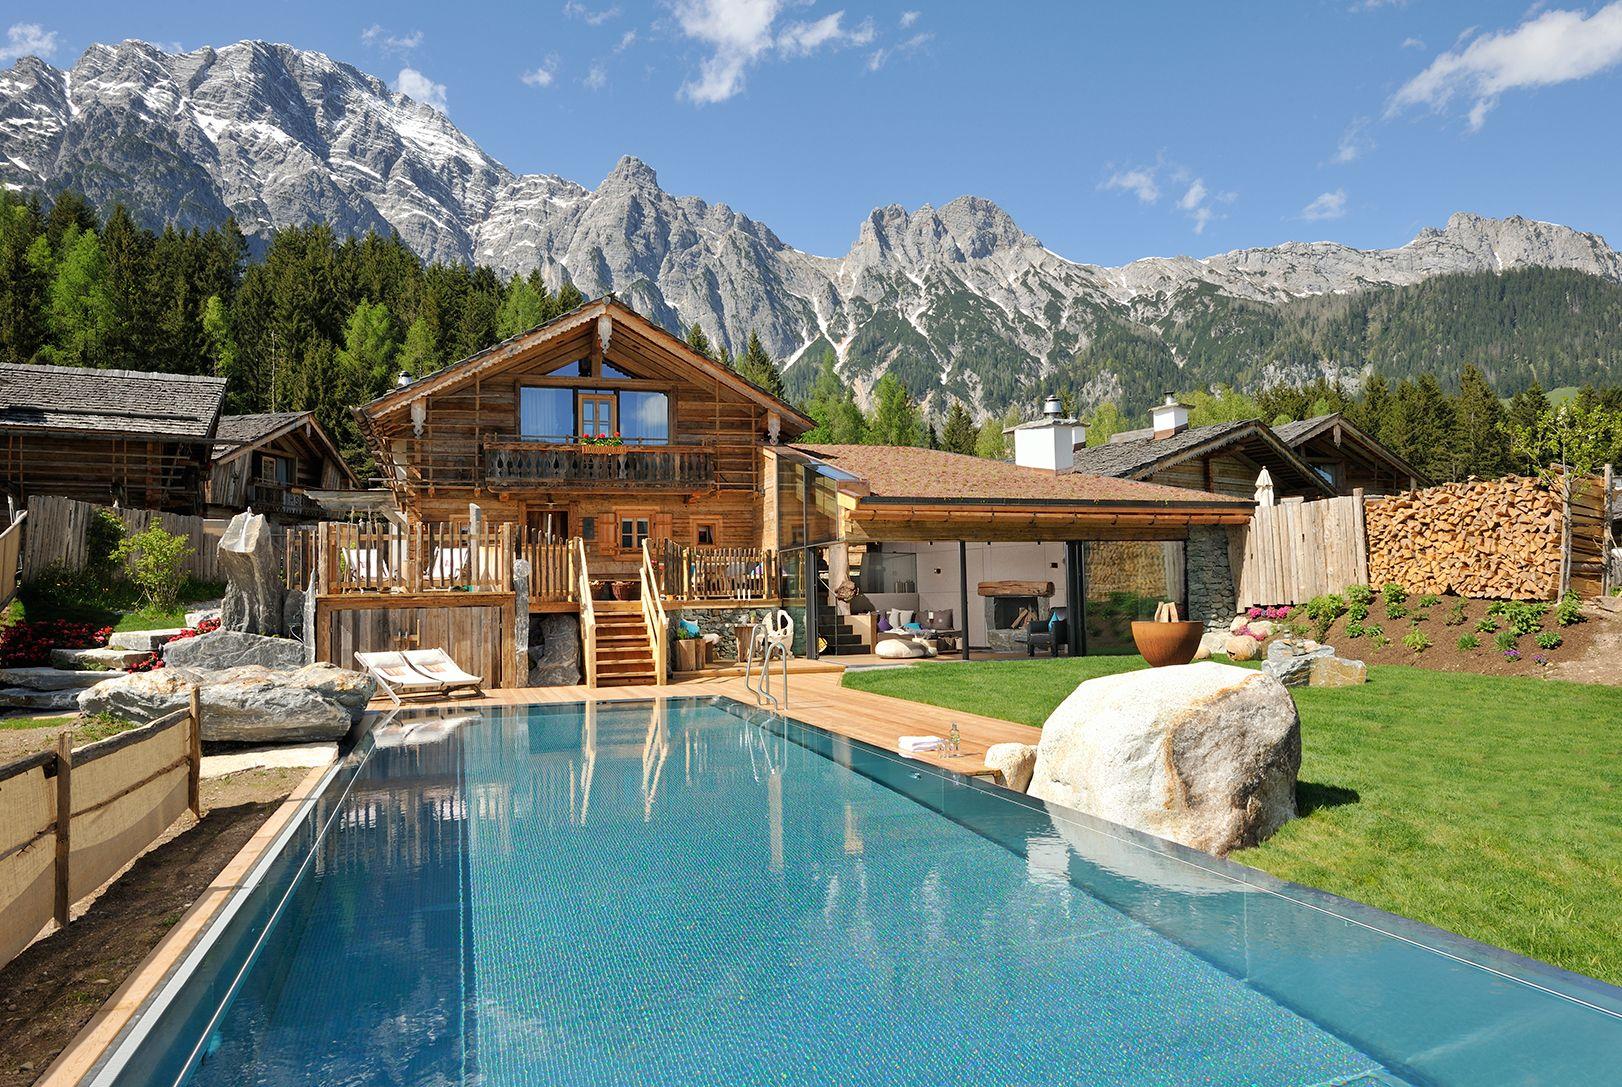 the alpine living spot in leogang austria bergdorf priesteregg visit and enjoy luxury alpine. Black Bedroom Furniture Sets. Home Design Ideas